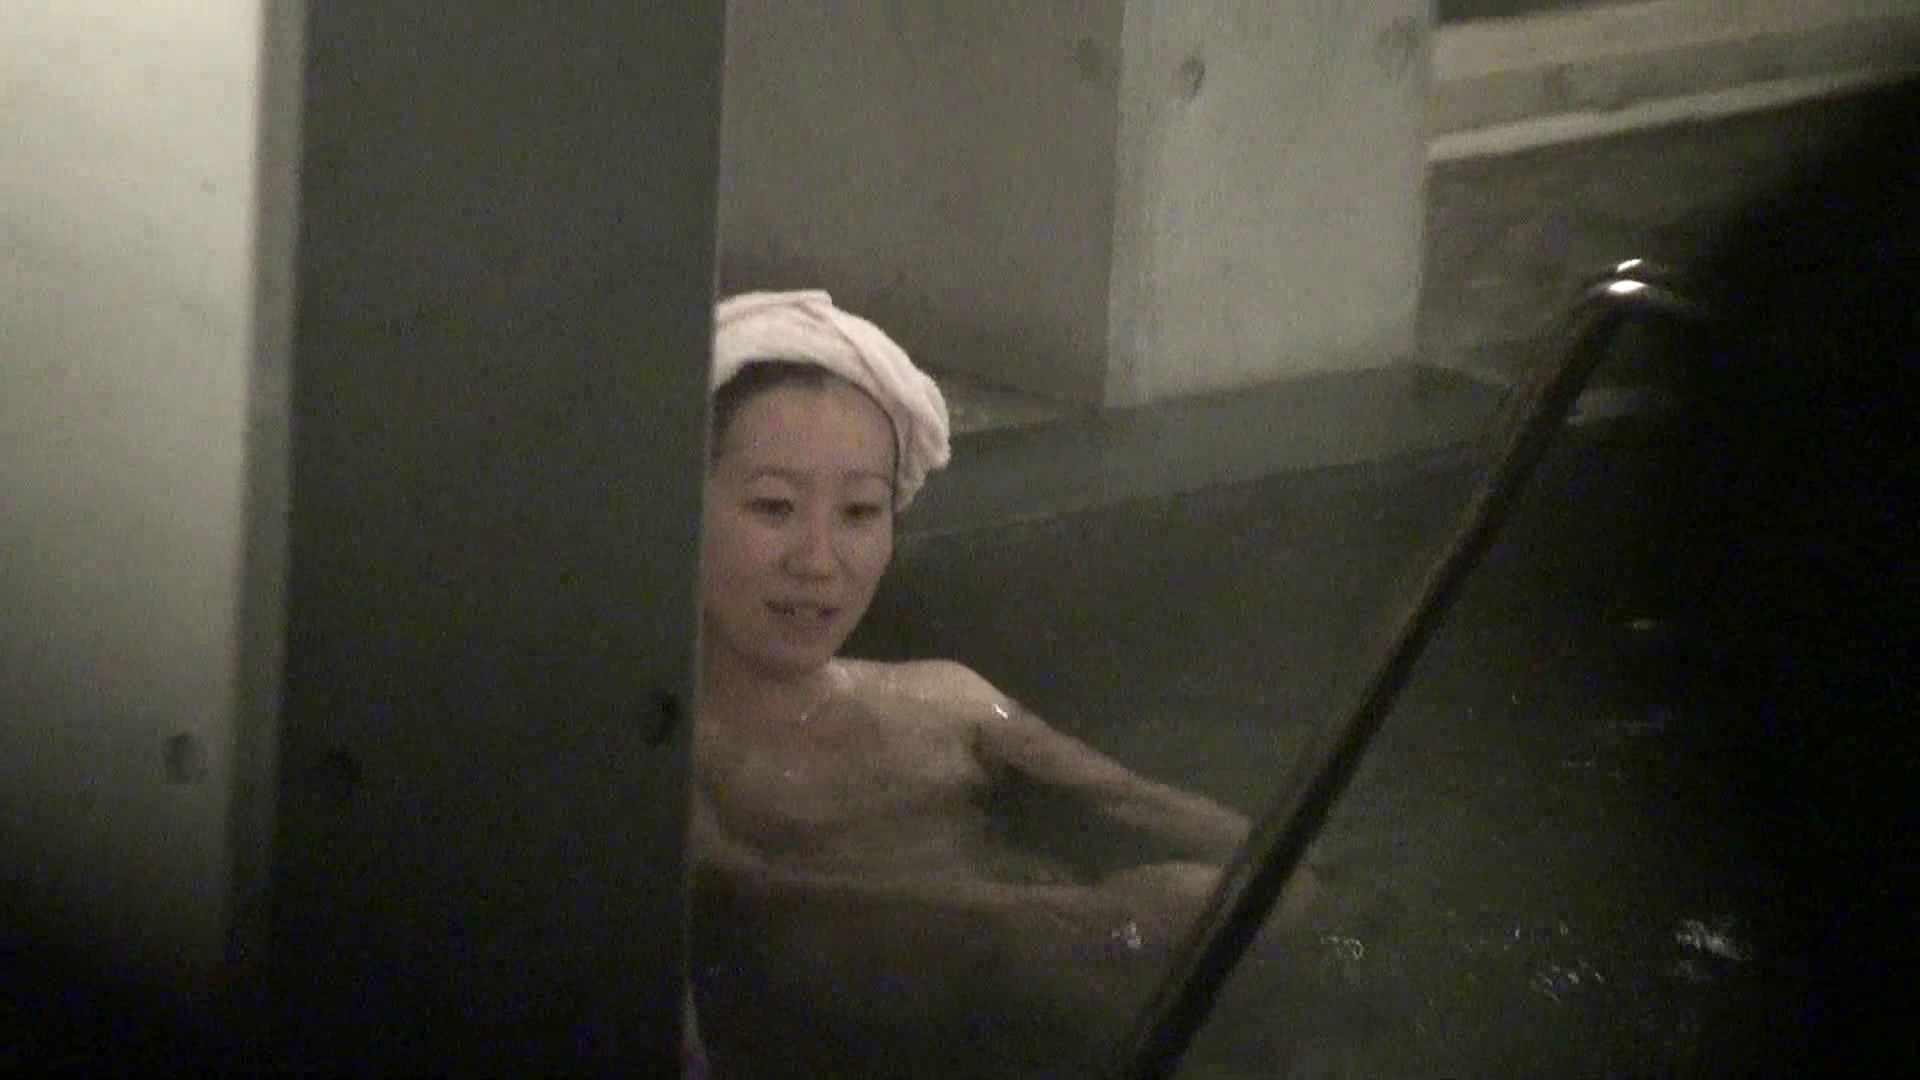 Aquaな露天風呂Vol.416 盗撮特撮 | OLのプライベート  10pic 1